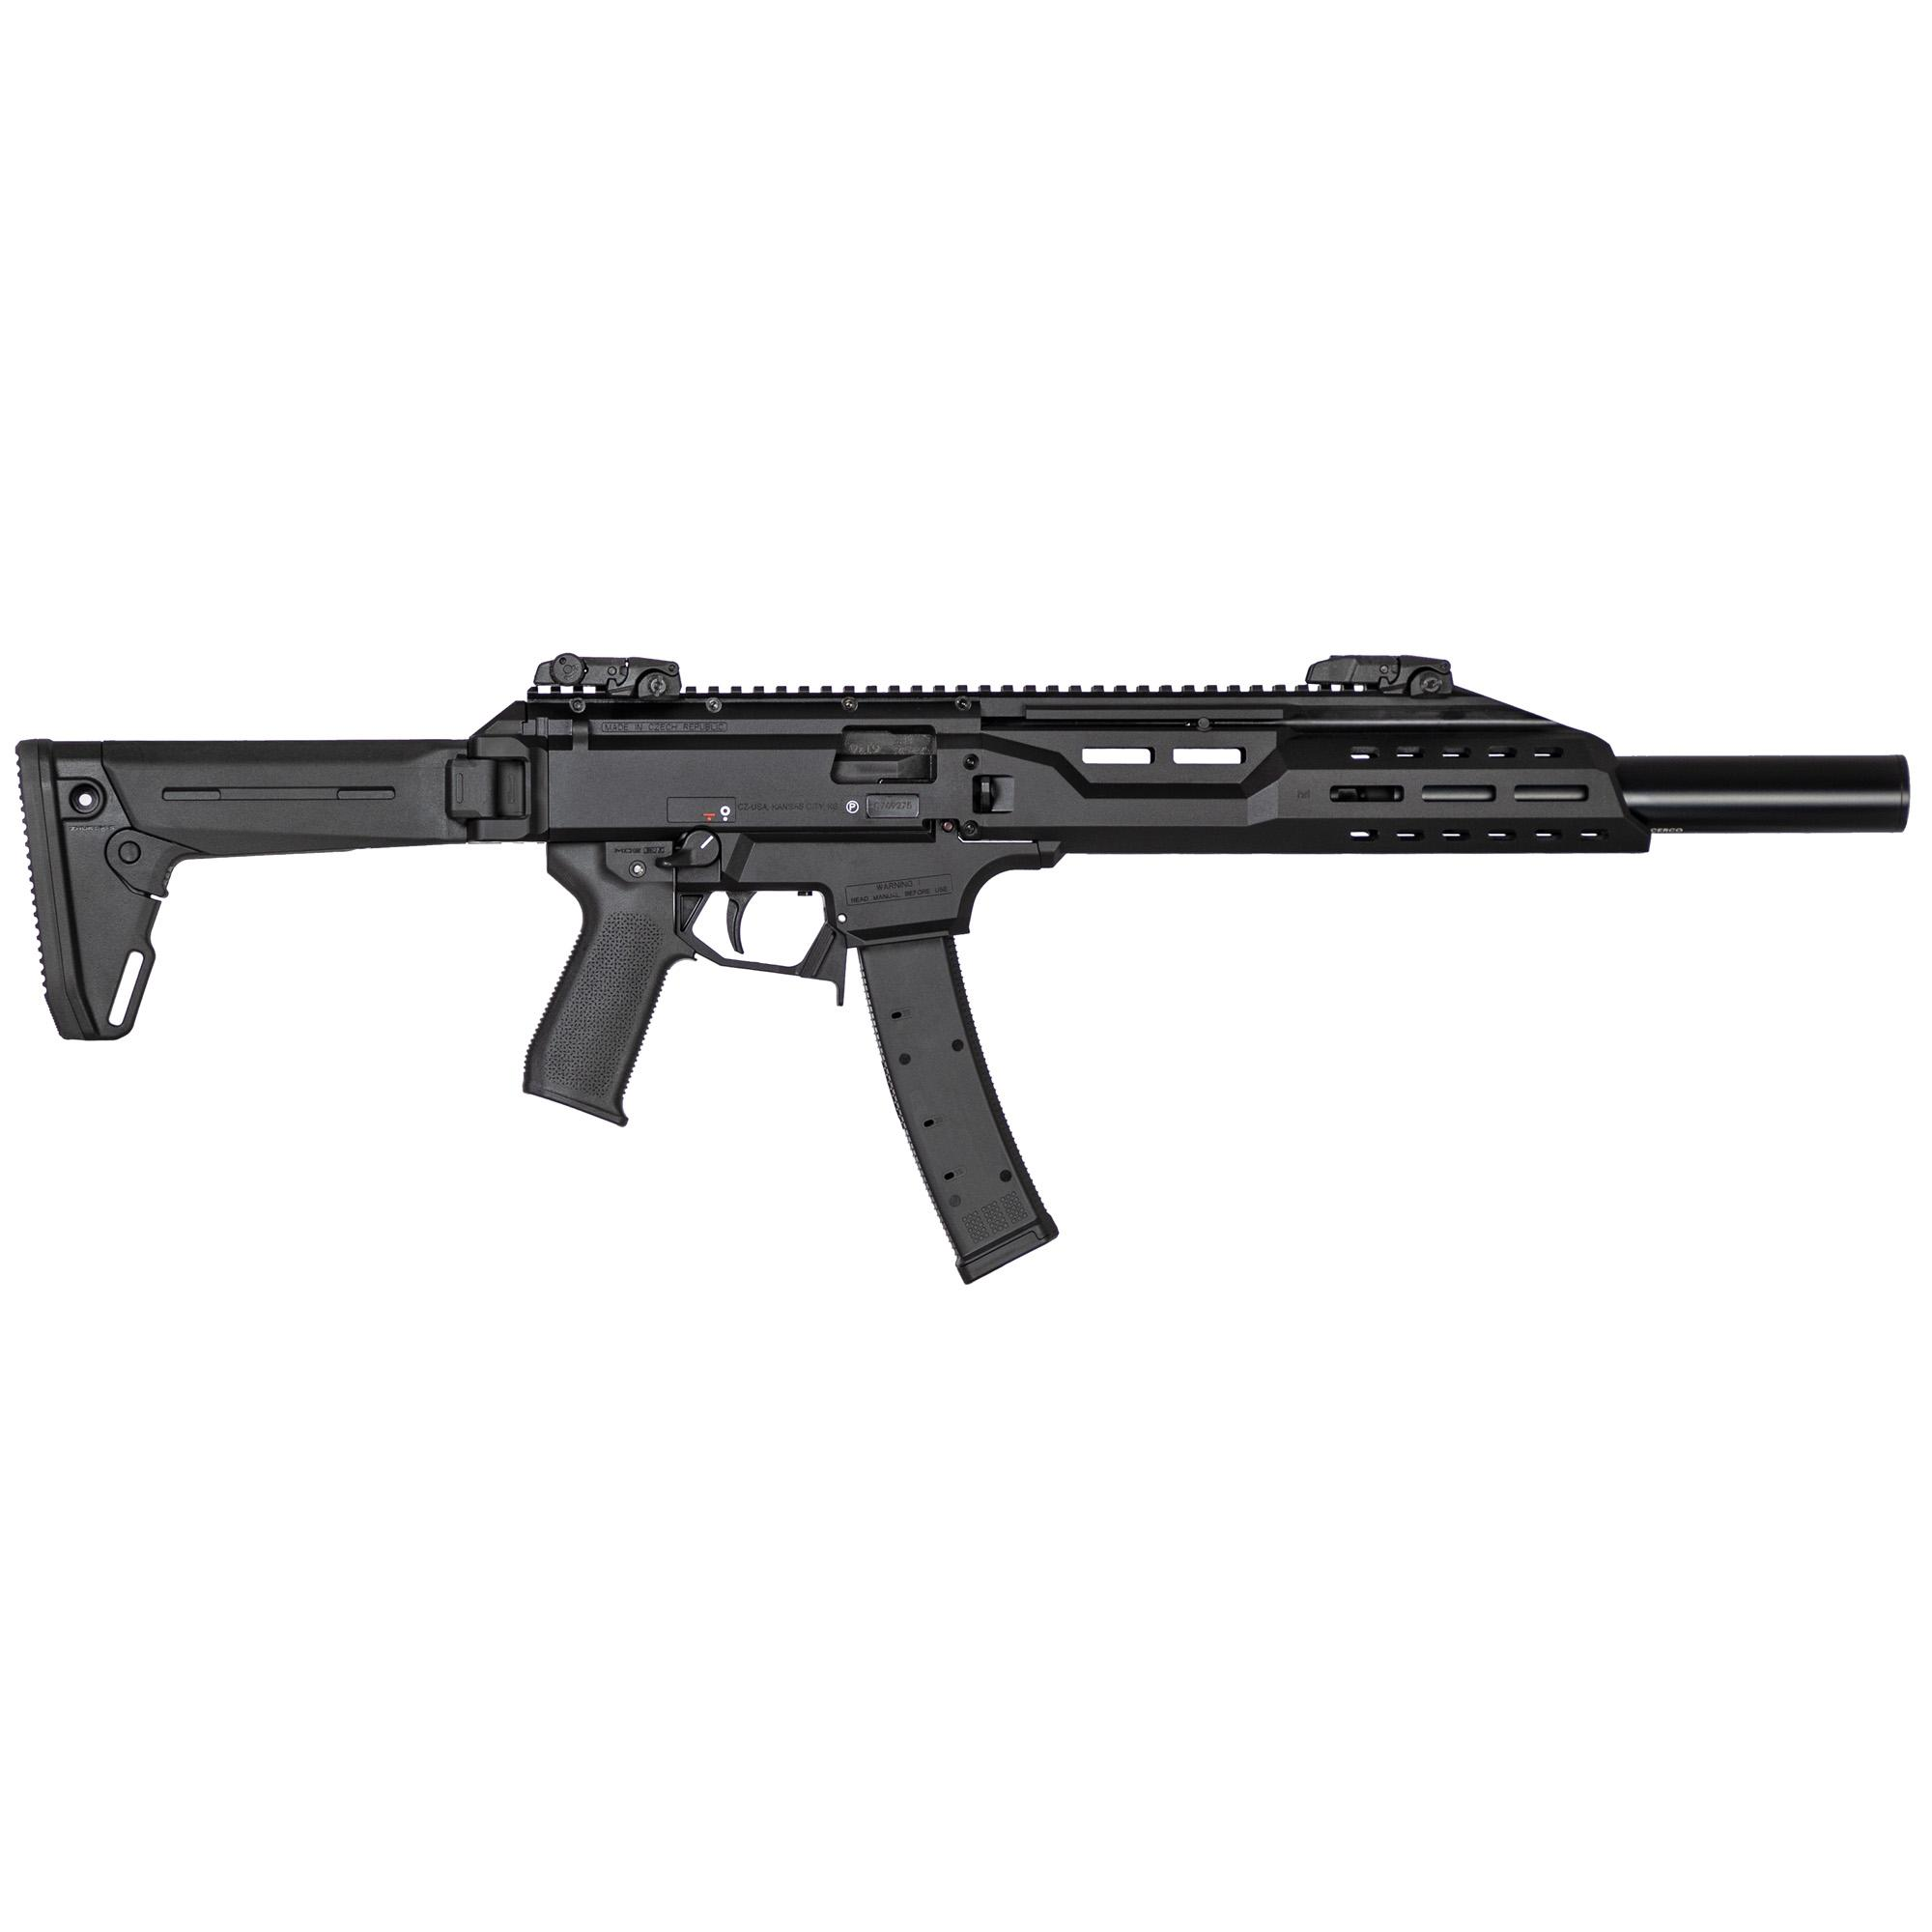 CZ Cz Scorpion Crb 9mm 16.2 35rd Black Fx